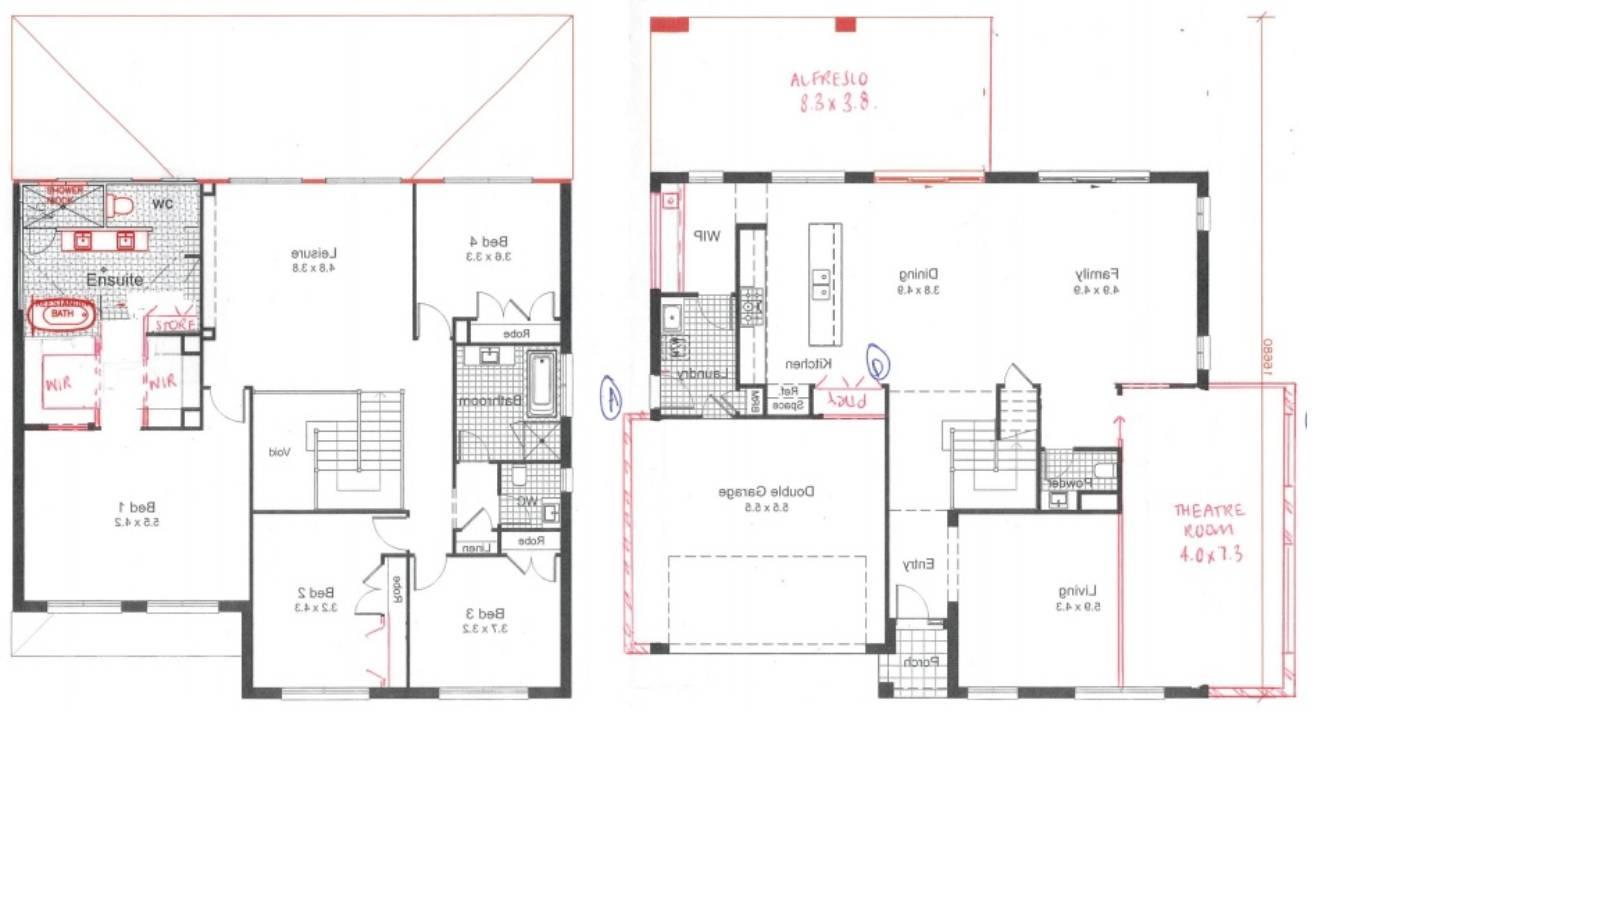 Please give me feedback on my floorplan